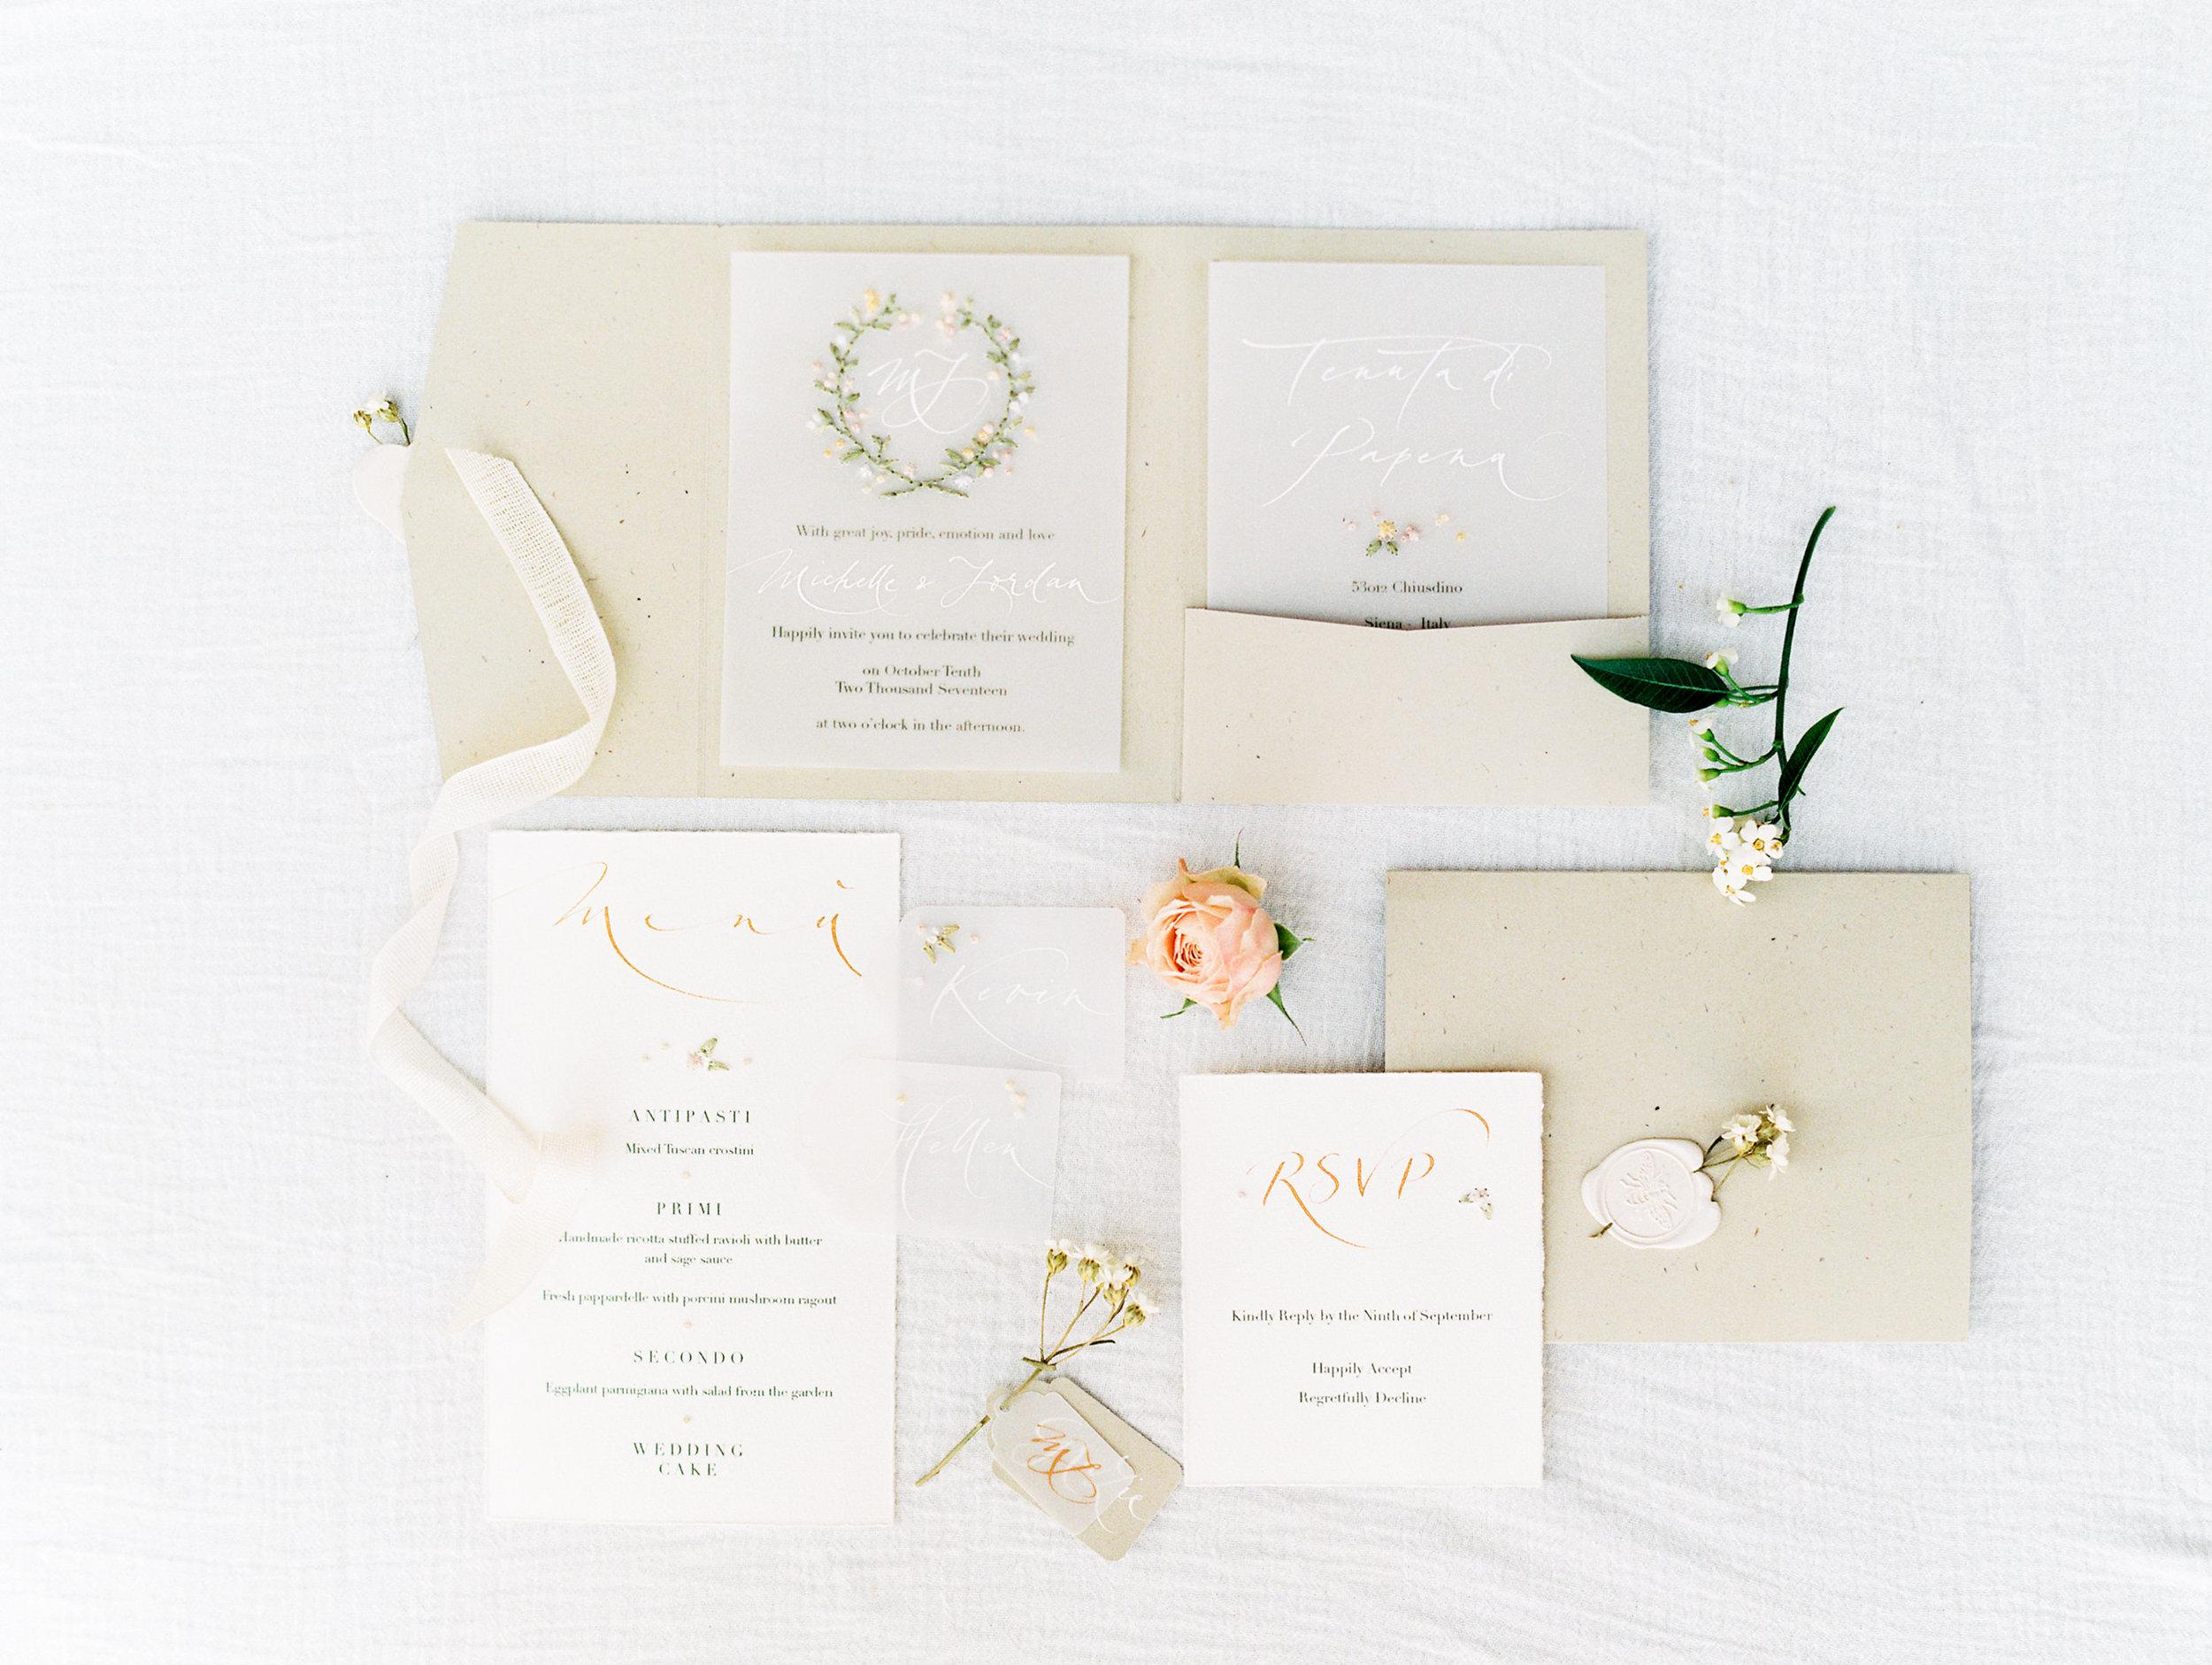 romantic-italy-wedding-in-tuscany-15.jpg